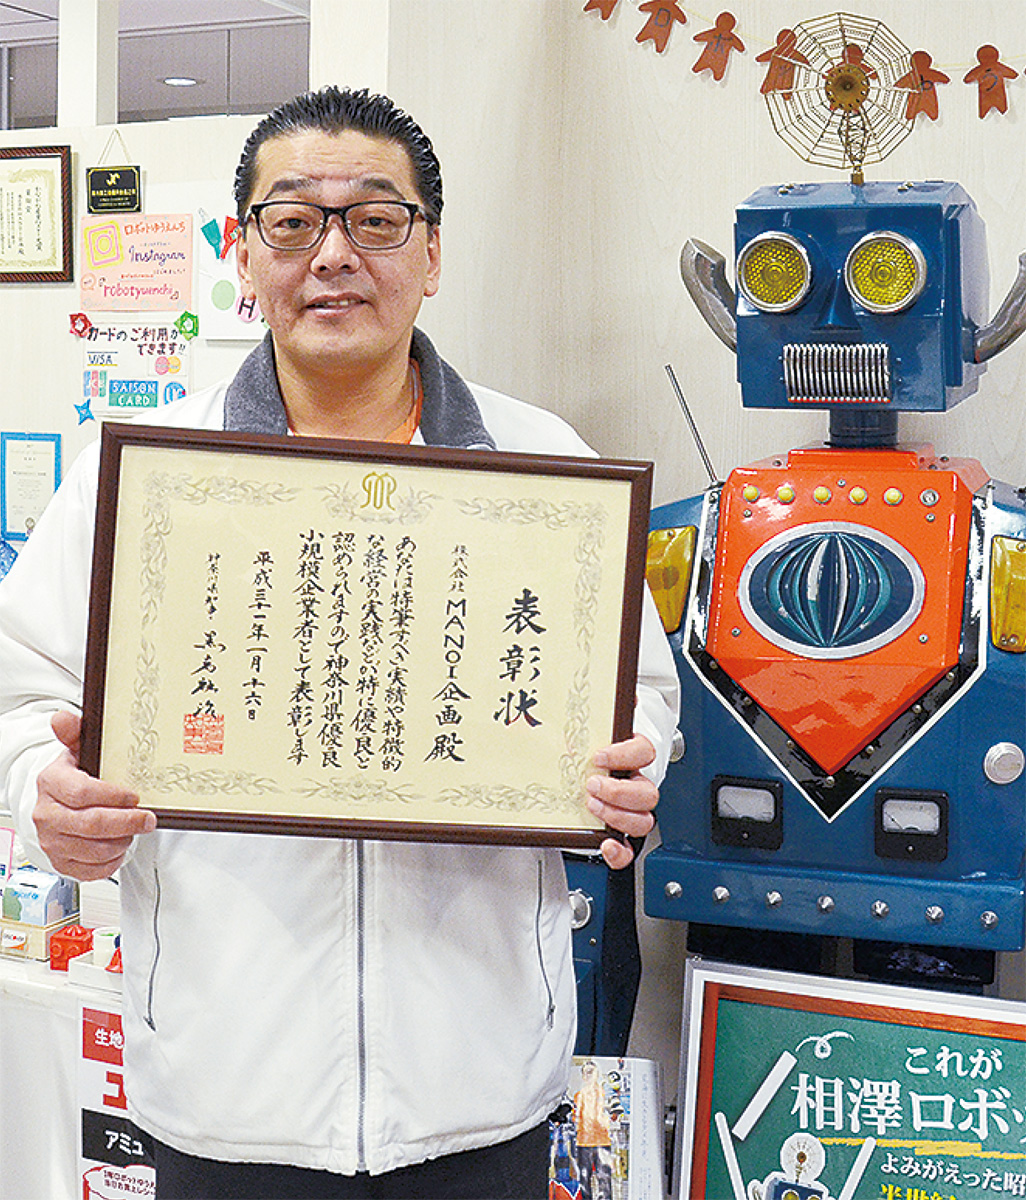 MANOI企画が県優良表彰